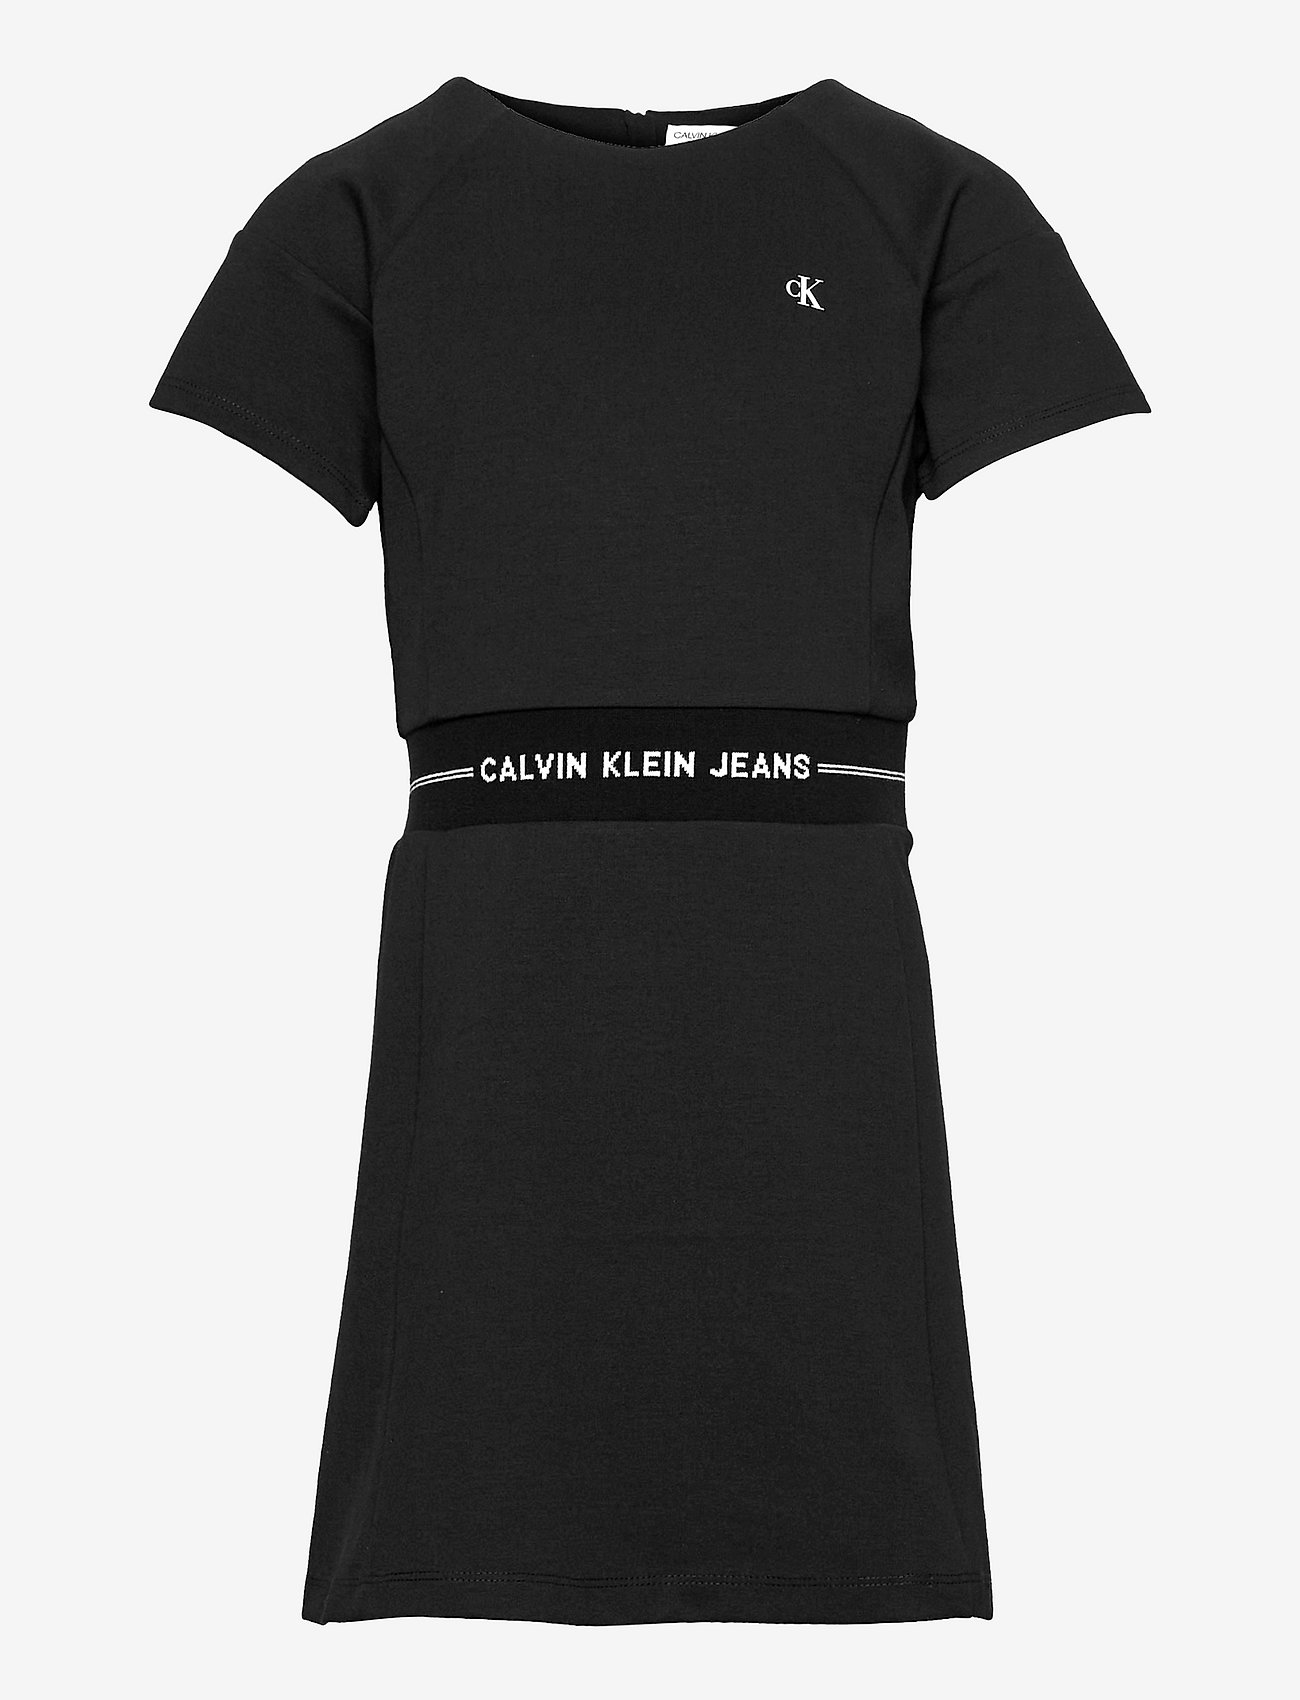 Calvin Klein - INTARSIA LOGO WAIST PUNTO DRESS - kleider - ck black - 0